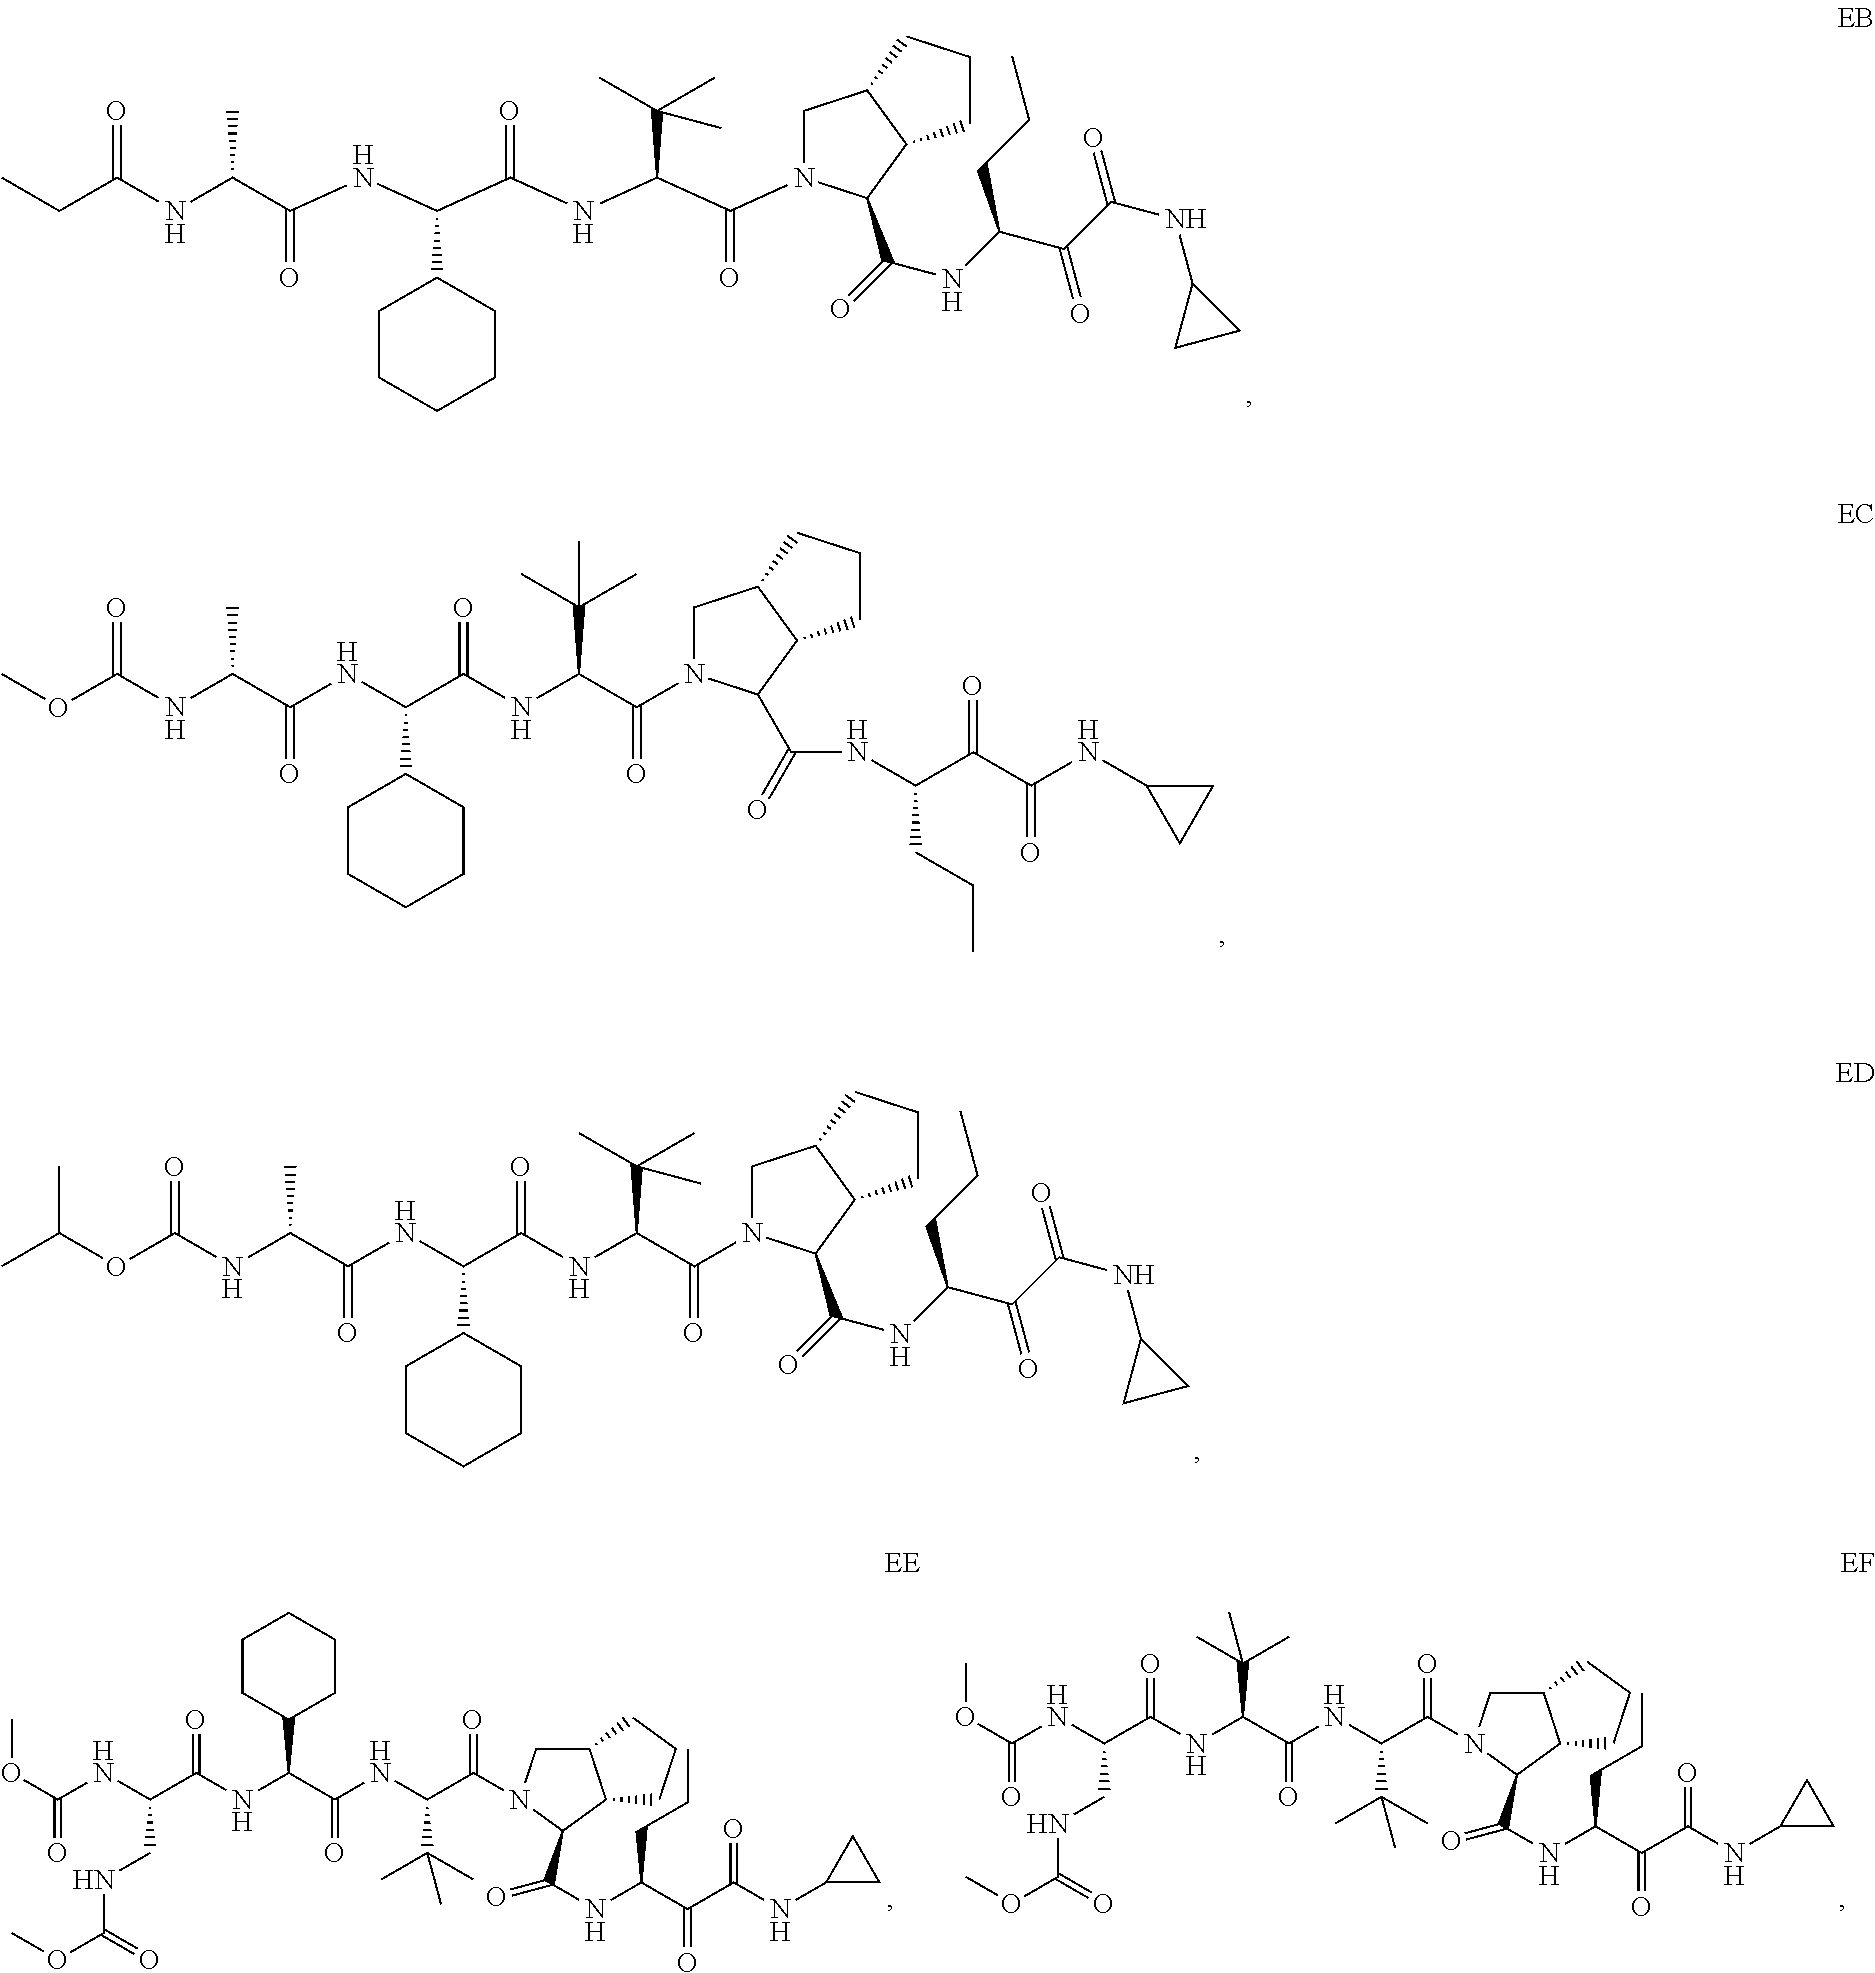 Us20140294763a1 Peptidomimetic Protease Inhibitors Google Patents Wiring Diagram Lowe 165 Fm Figure 20141002 C00075